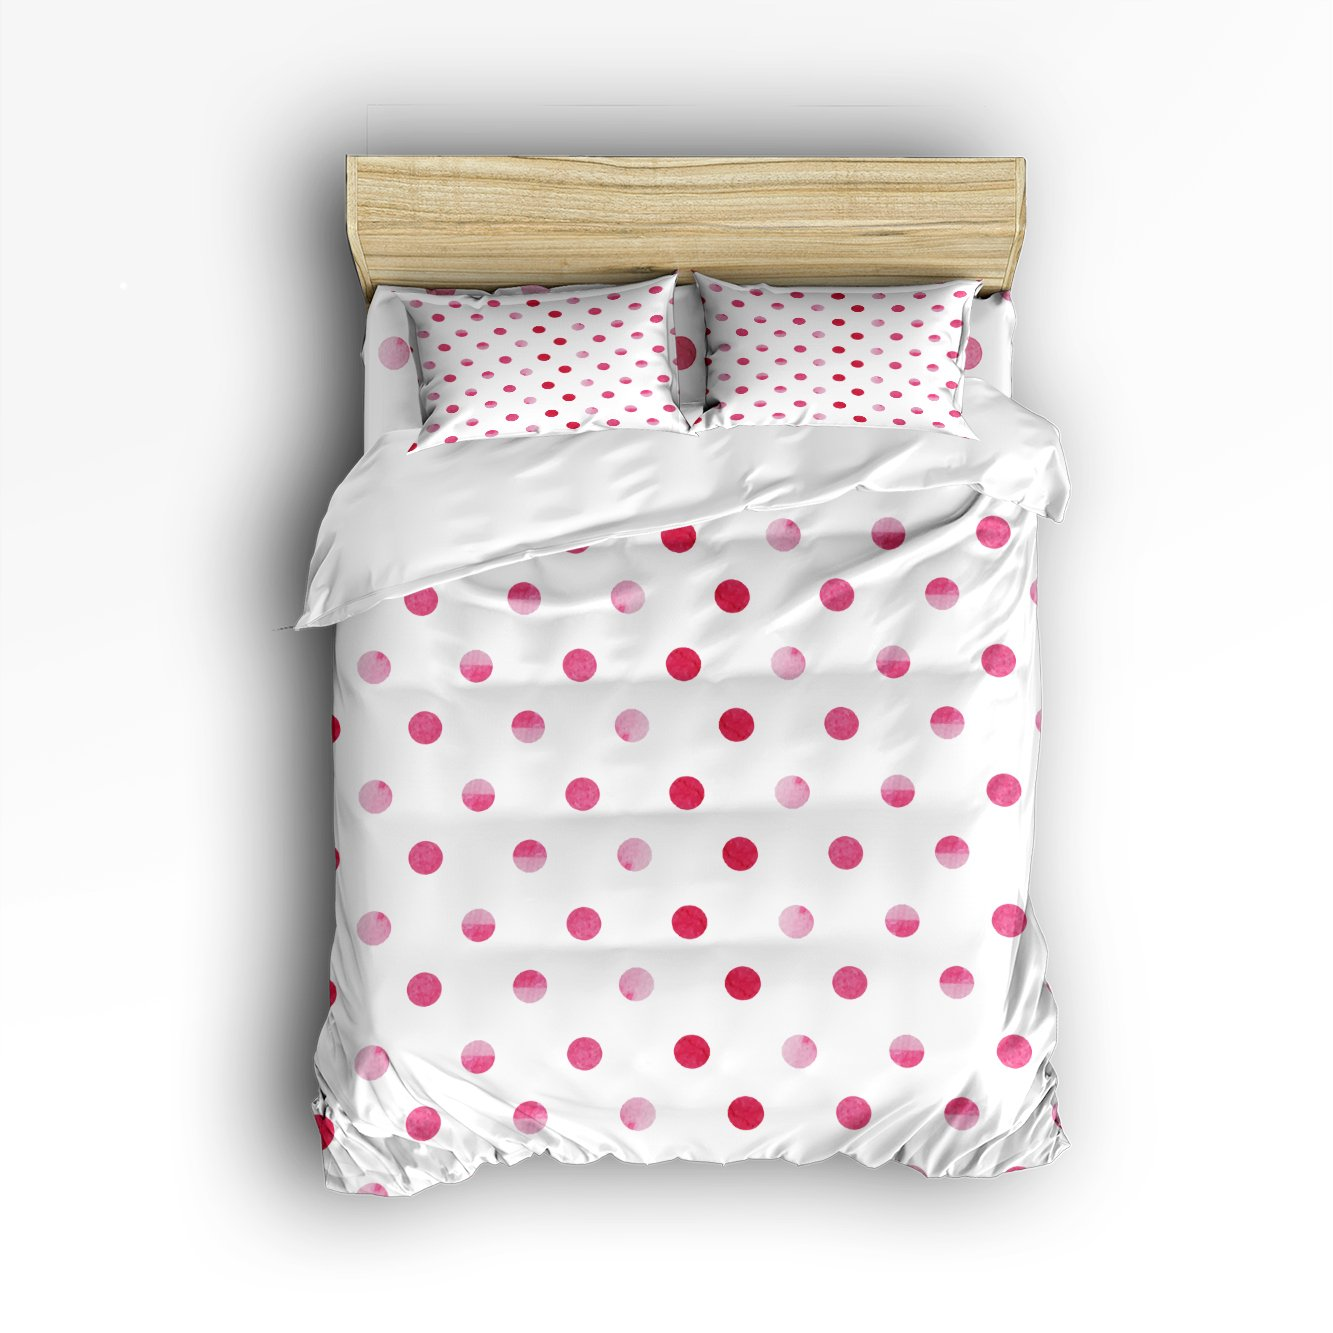 Libaoge 4 Piece Bed Sheets Set, Polka Dot Print, 1 Flat Sheet 1 Duvet Cover and 2 Pillow Cases